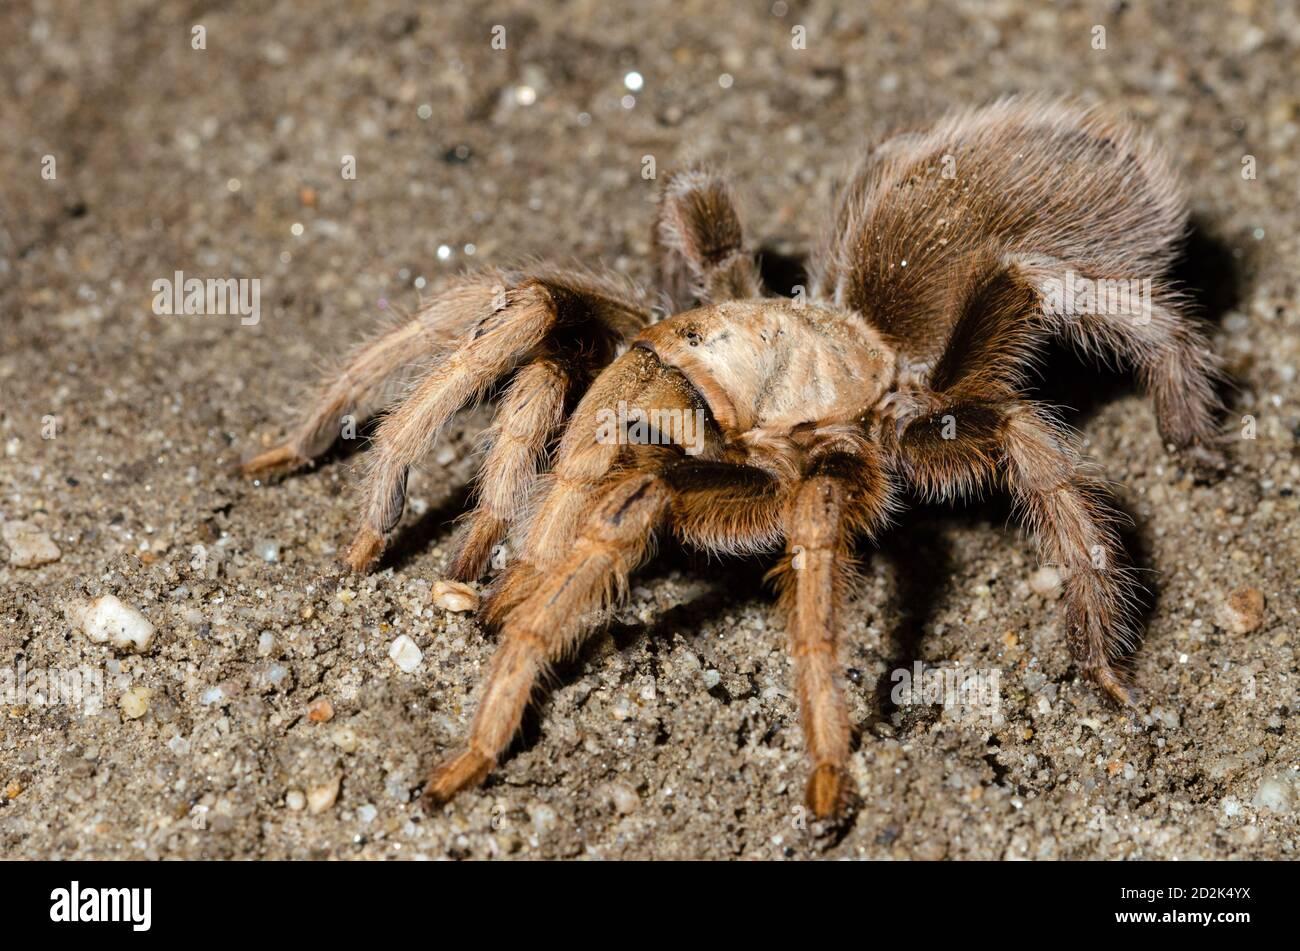 Desert Tarantula Aphonopelma Chalcodes Stock Photo Alamy